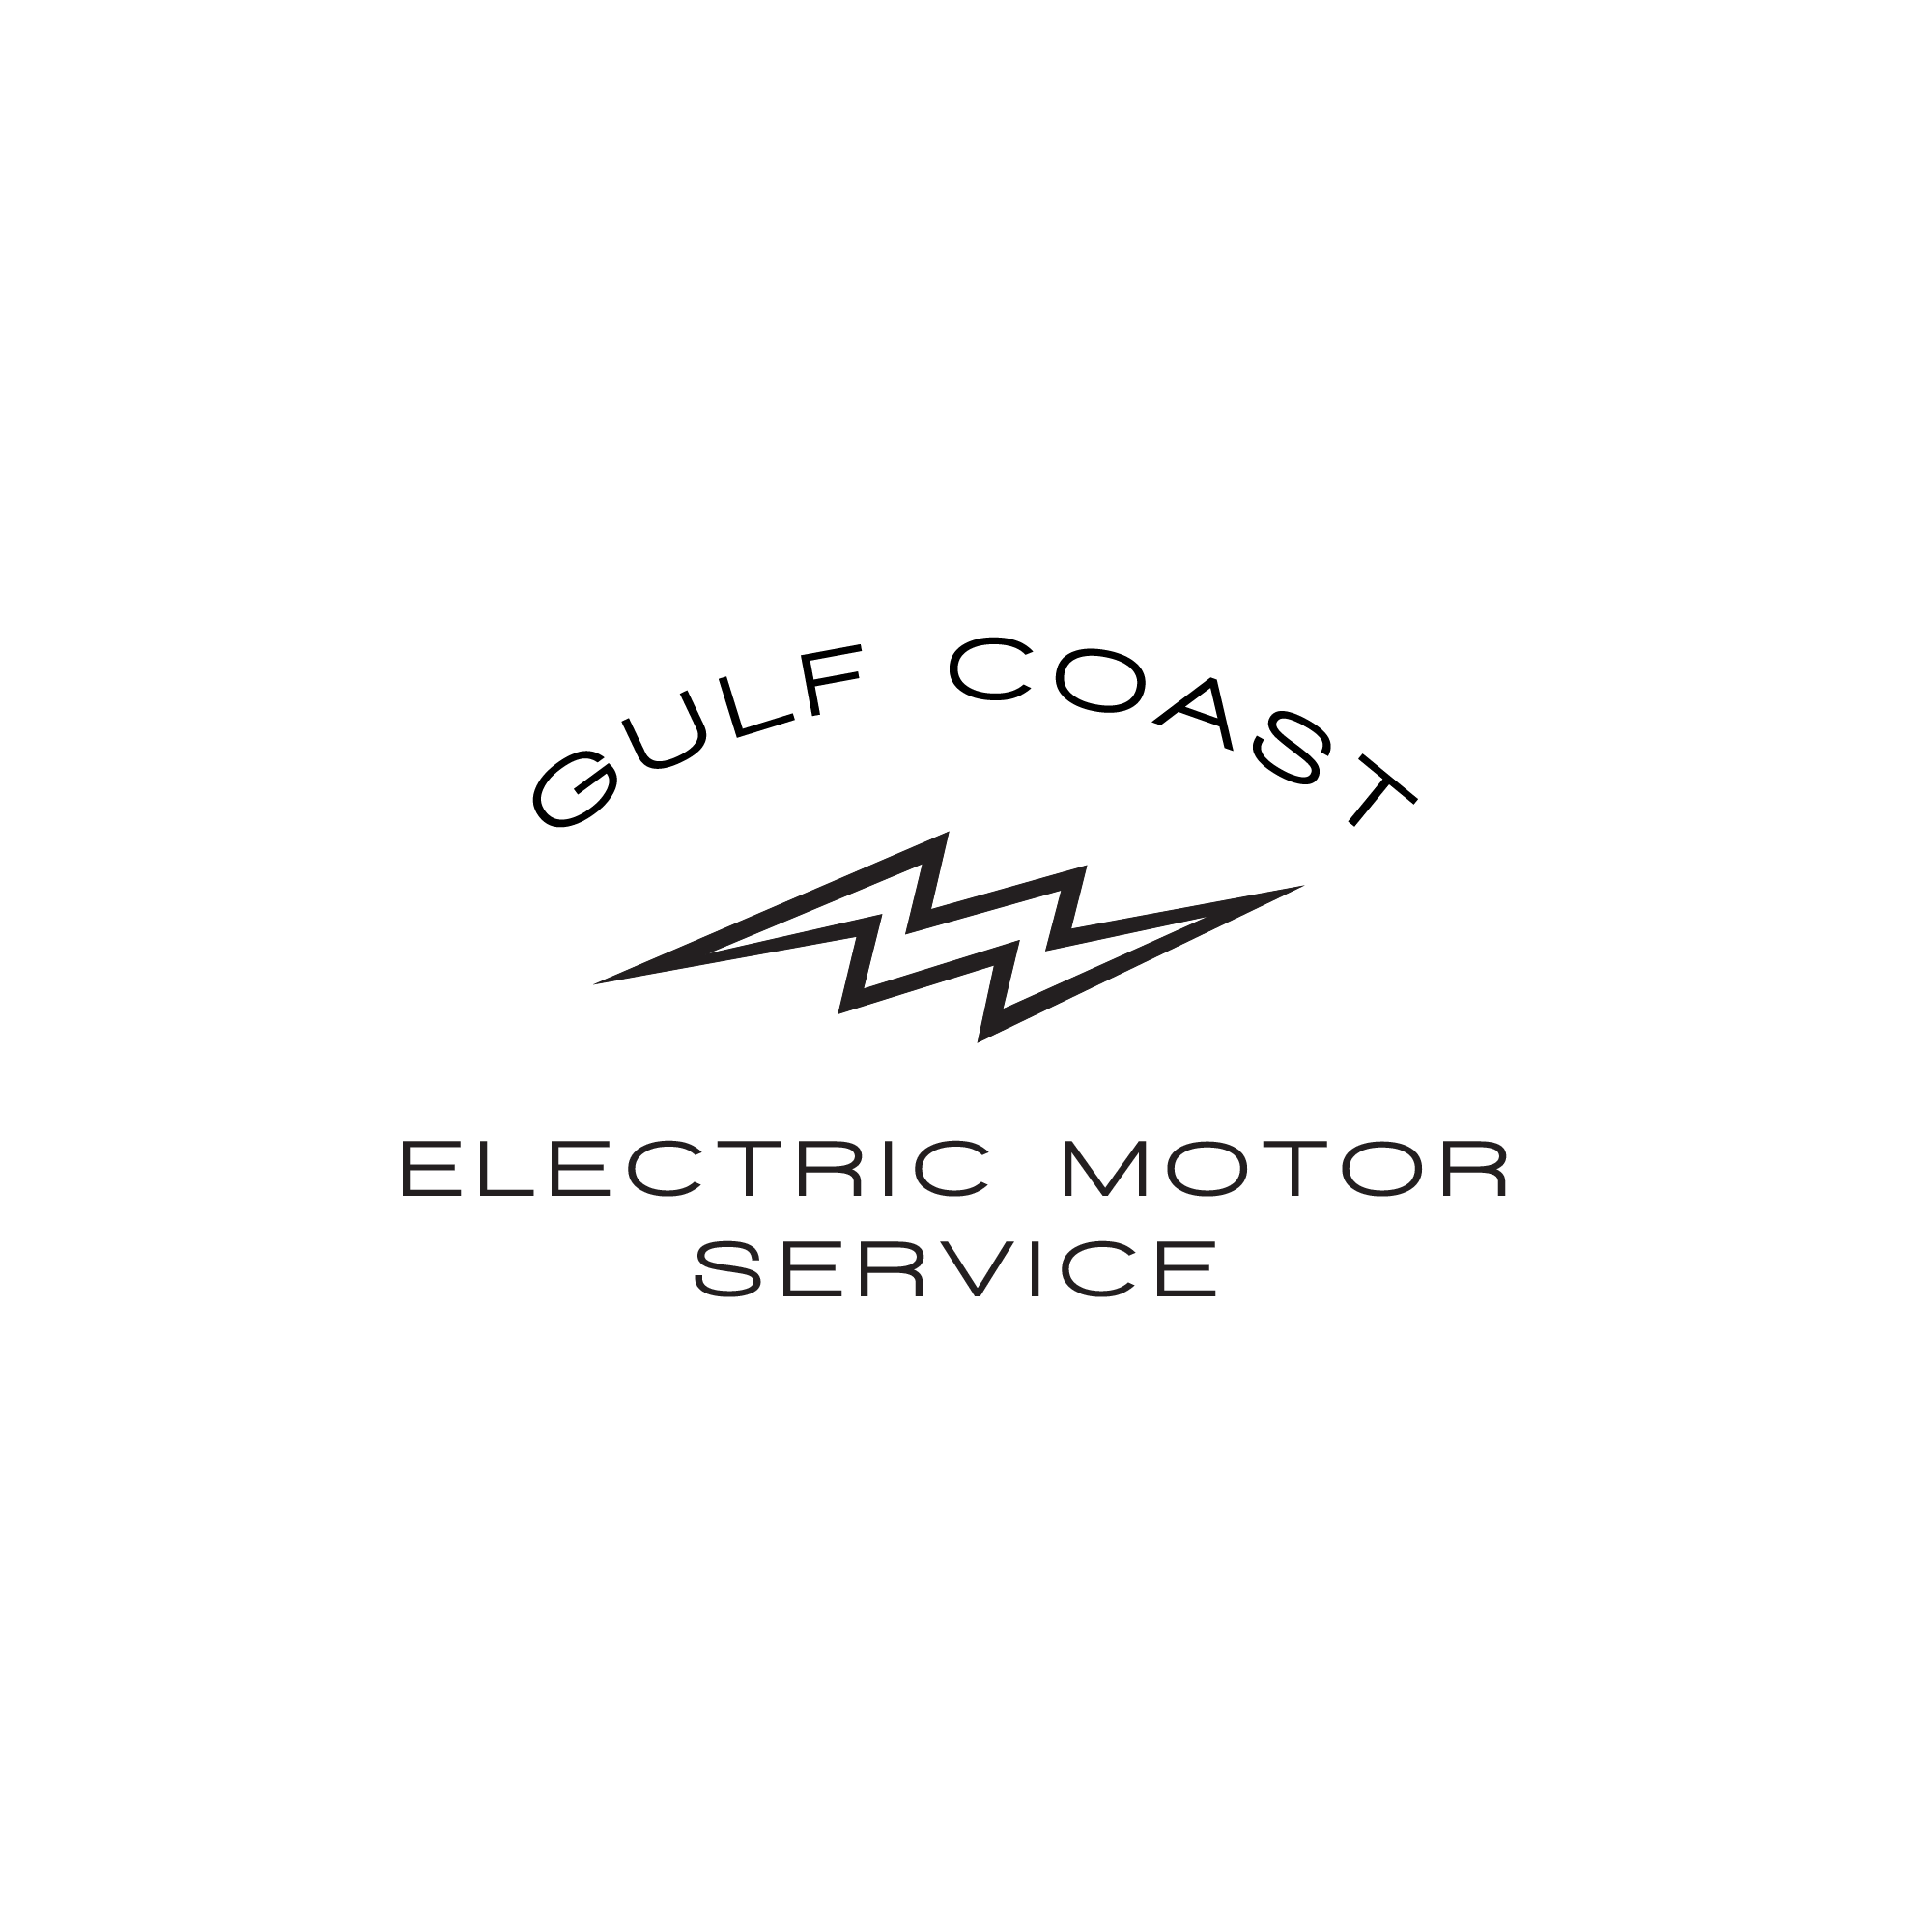 Gulf Coast Electric Motor Service Logo